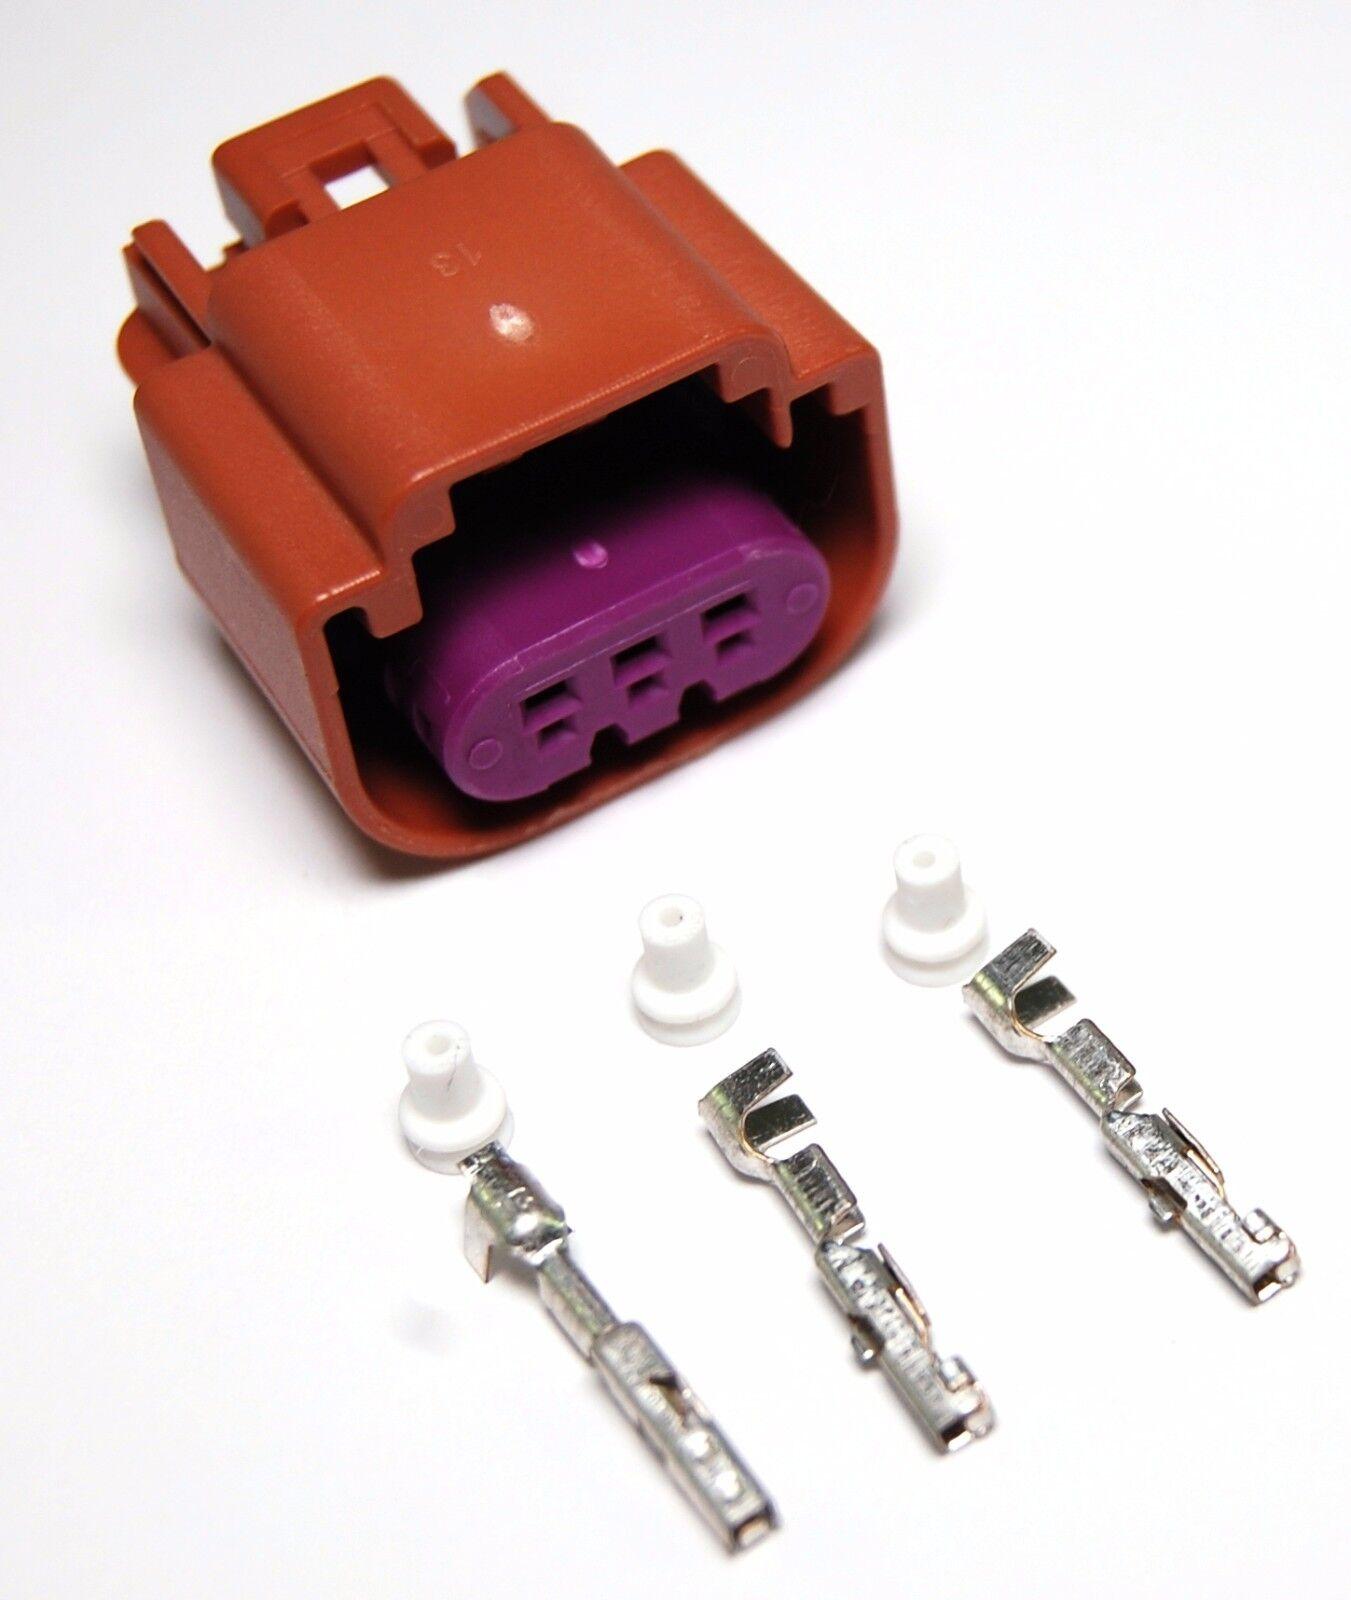 delphi ethanol flex fuel e85 sensor connector ebay. Black Bedroom Furniture Sets. Home Design Ideas